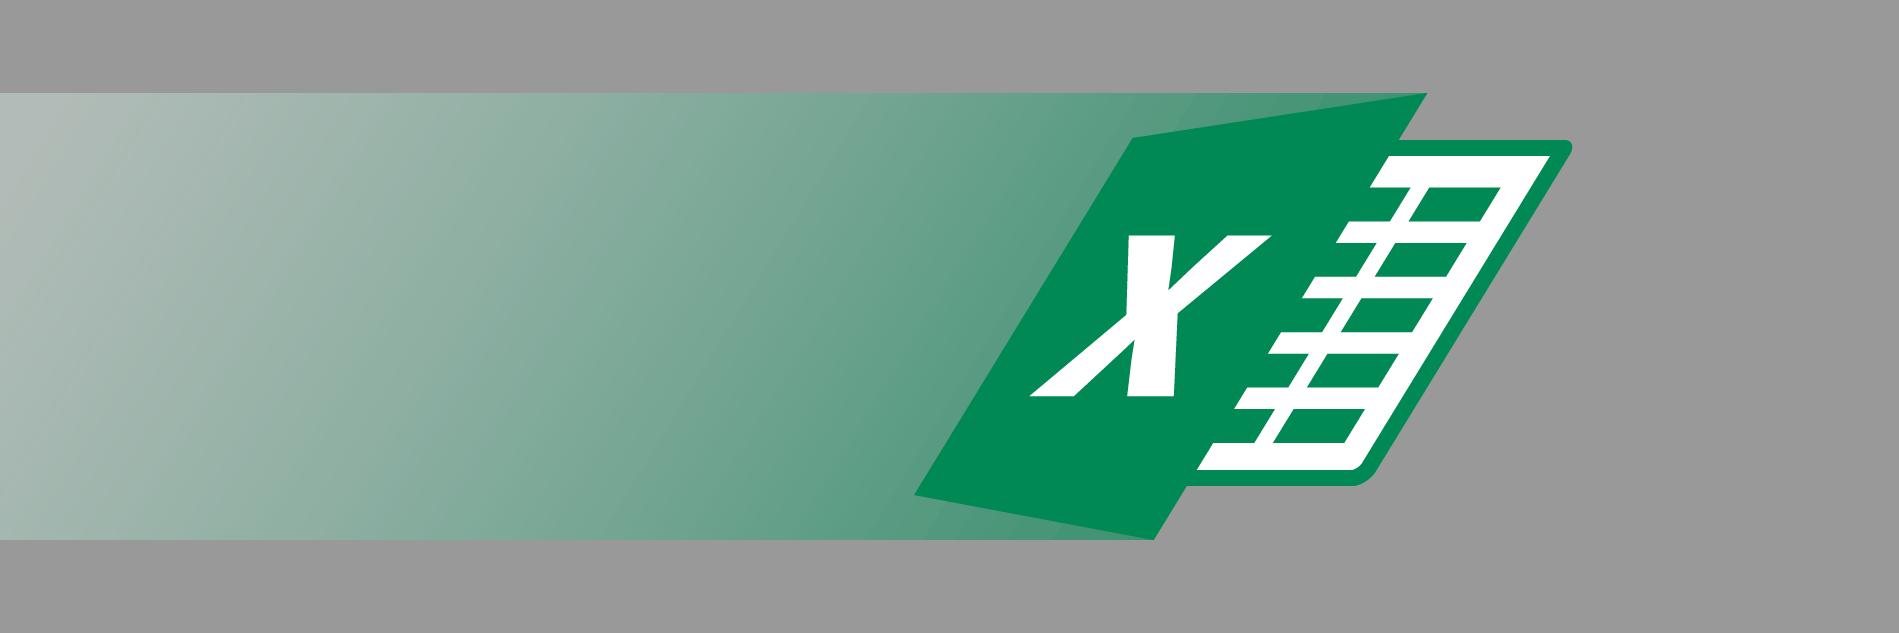 Excelでの書類作成やデータ入力の効率を手っ取り早く上げる方法